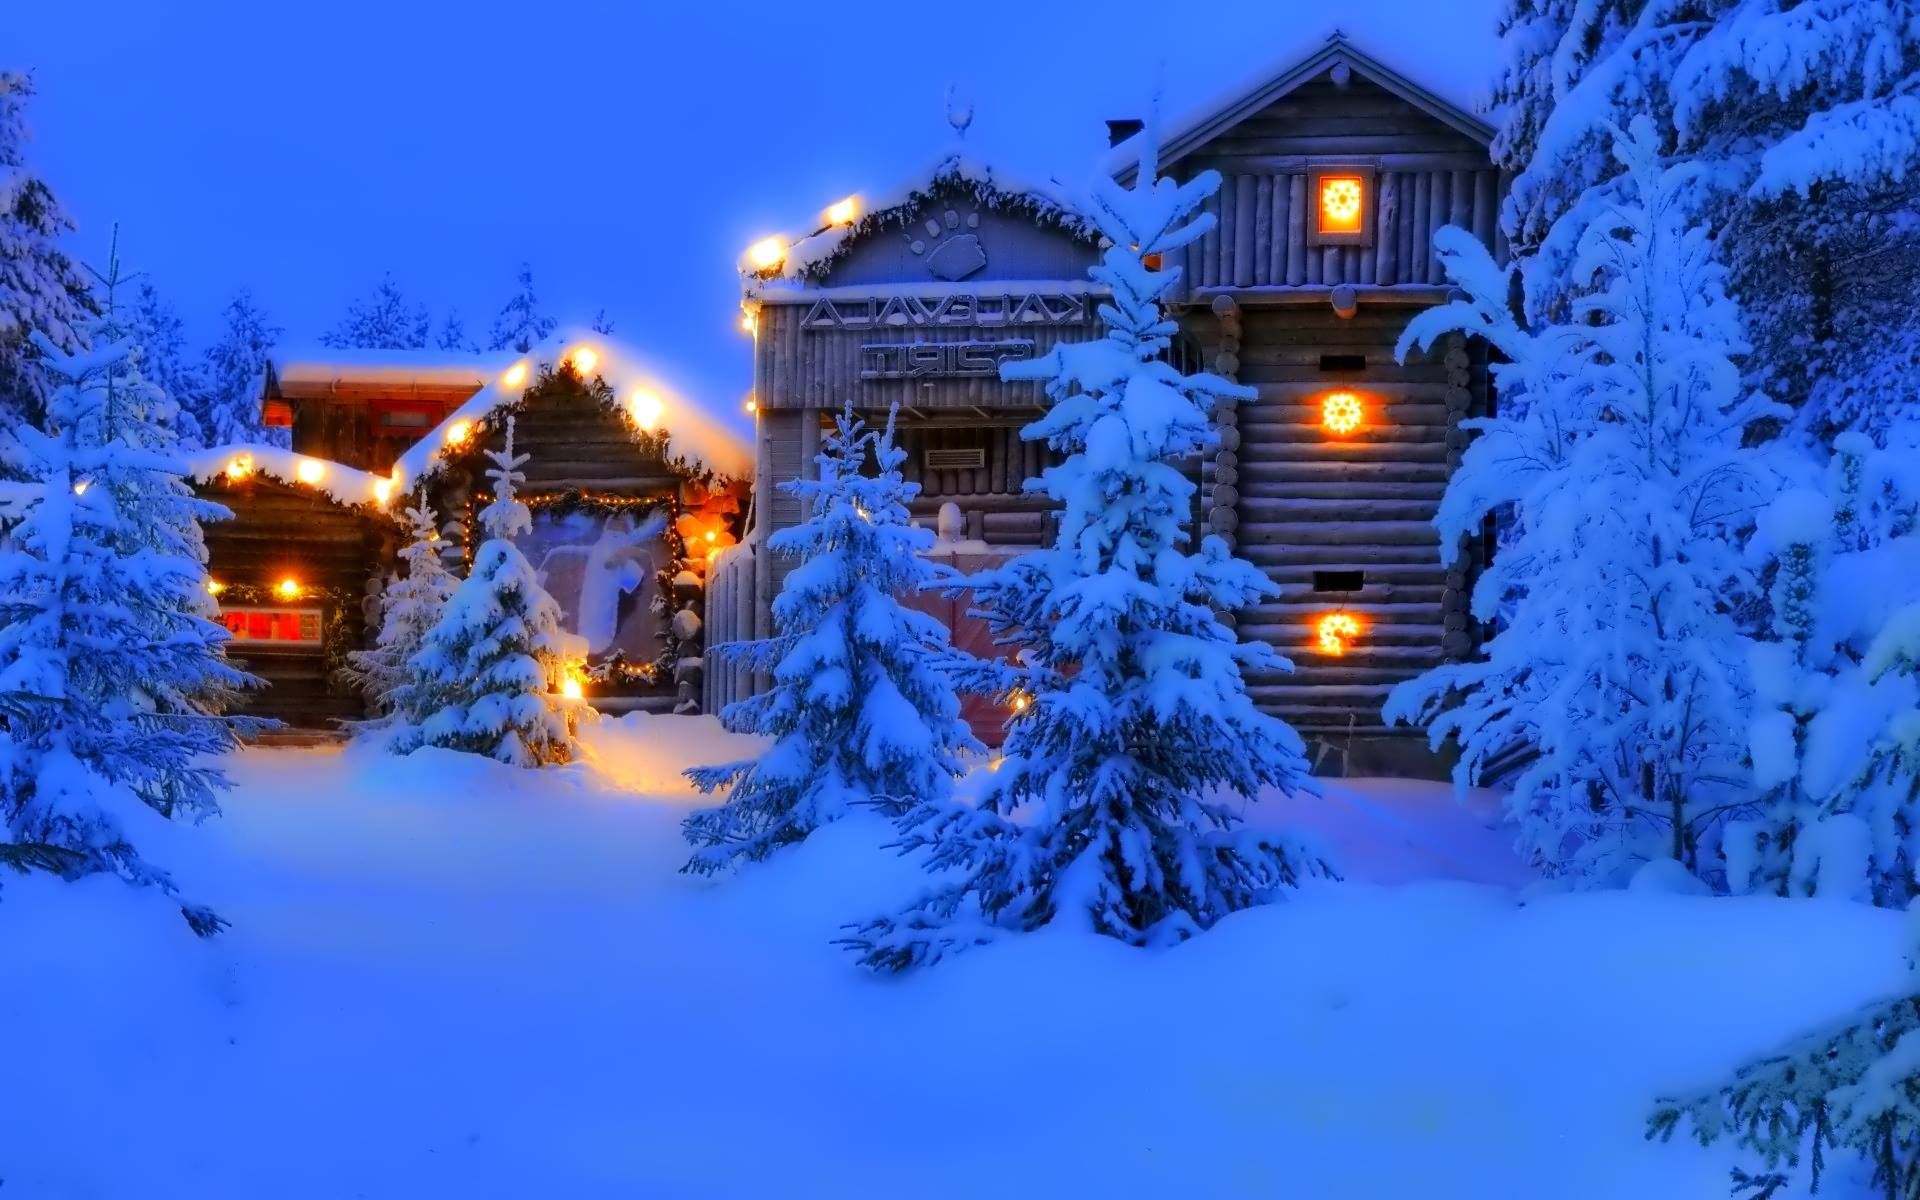 Зимний вечер | Путешествия, Открытки, Зима